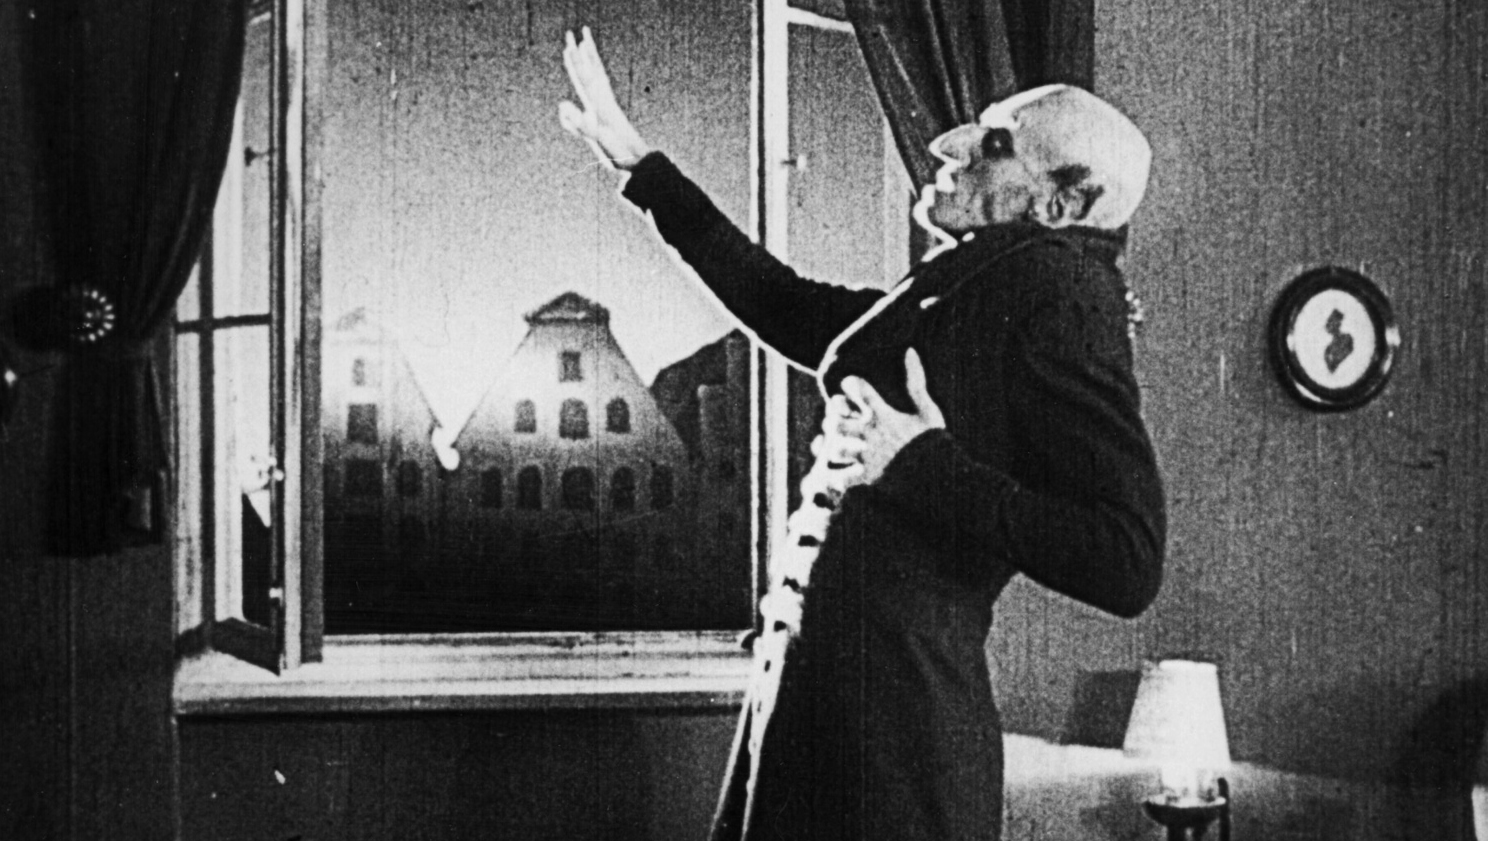 Nosferatu Backgrounds on Wallpapers Vista